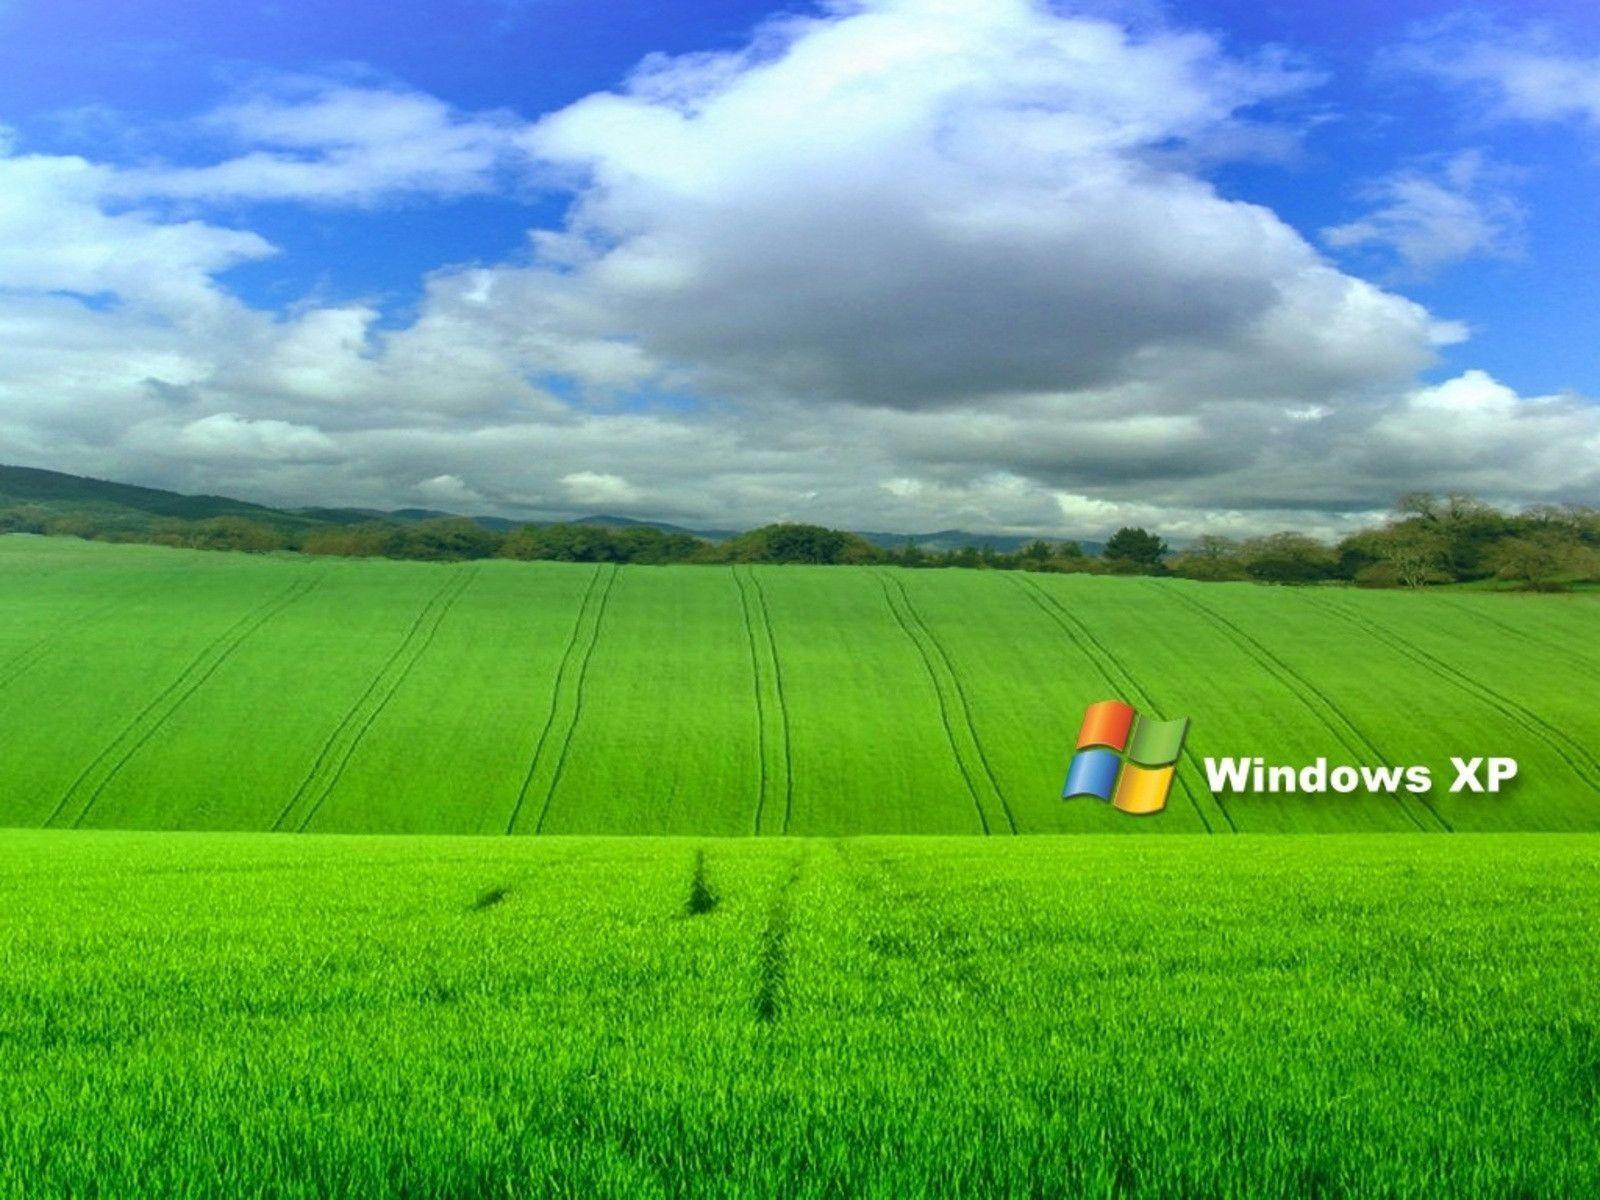 Desktop background image location windows xp